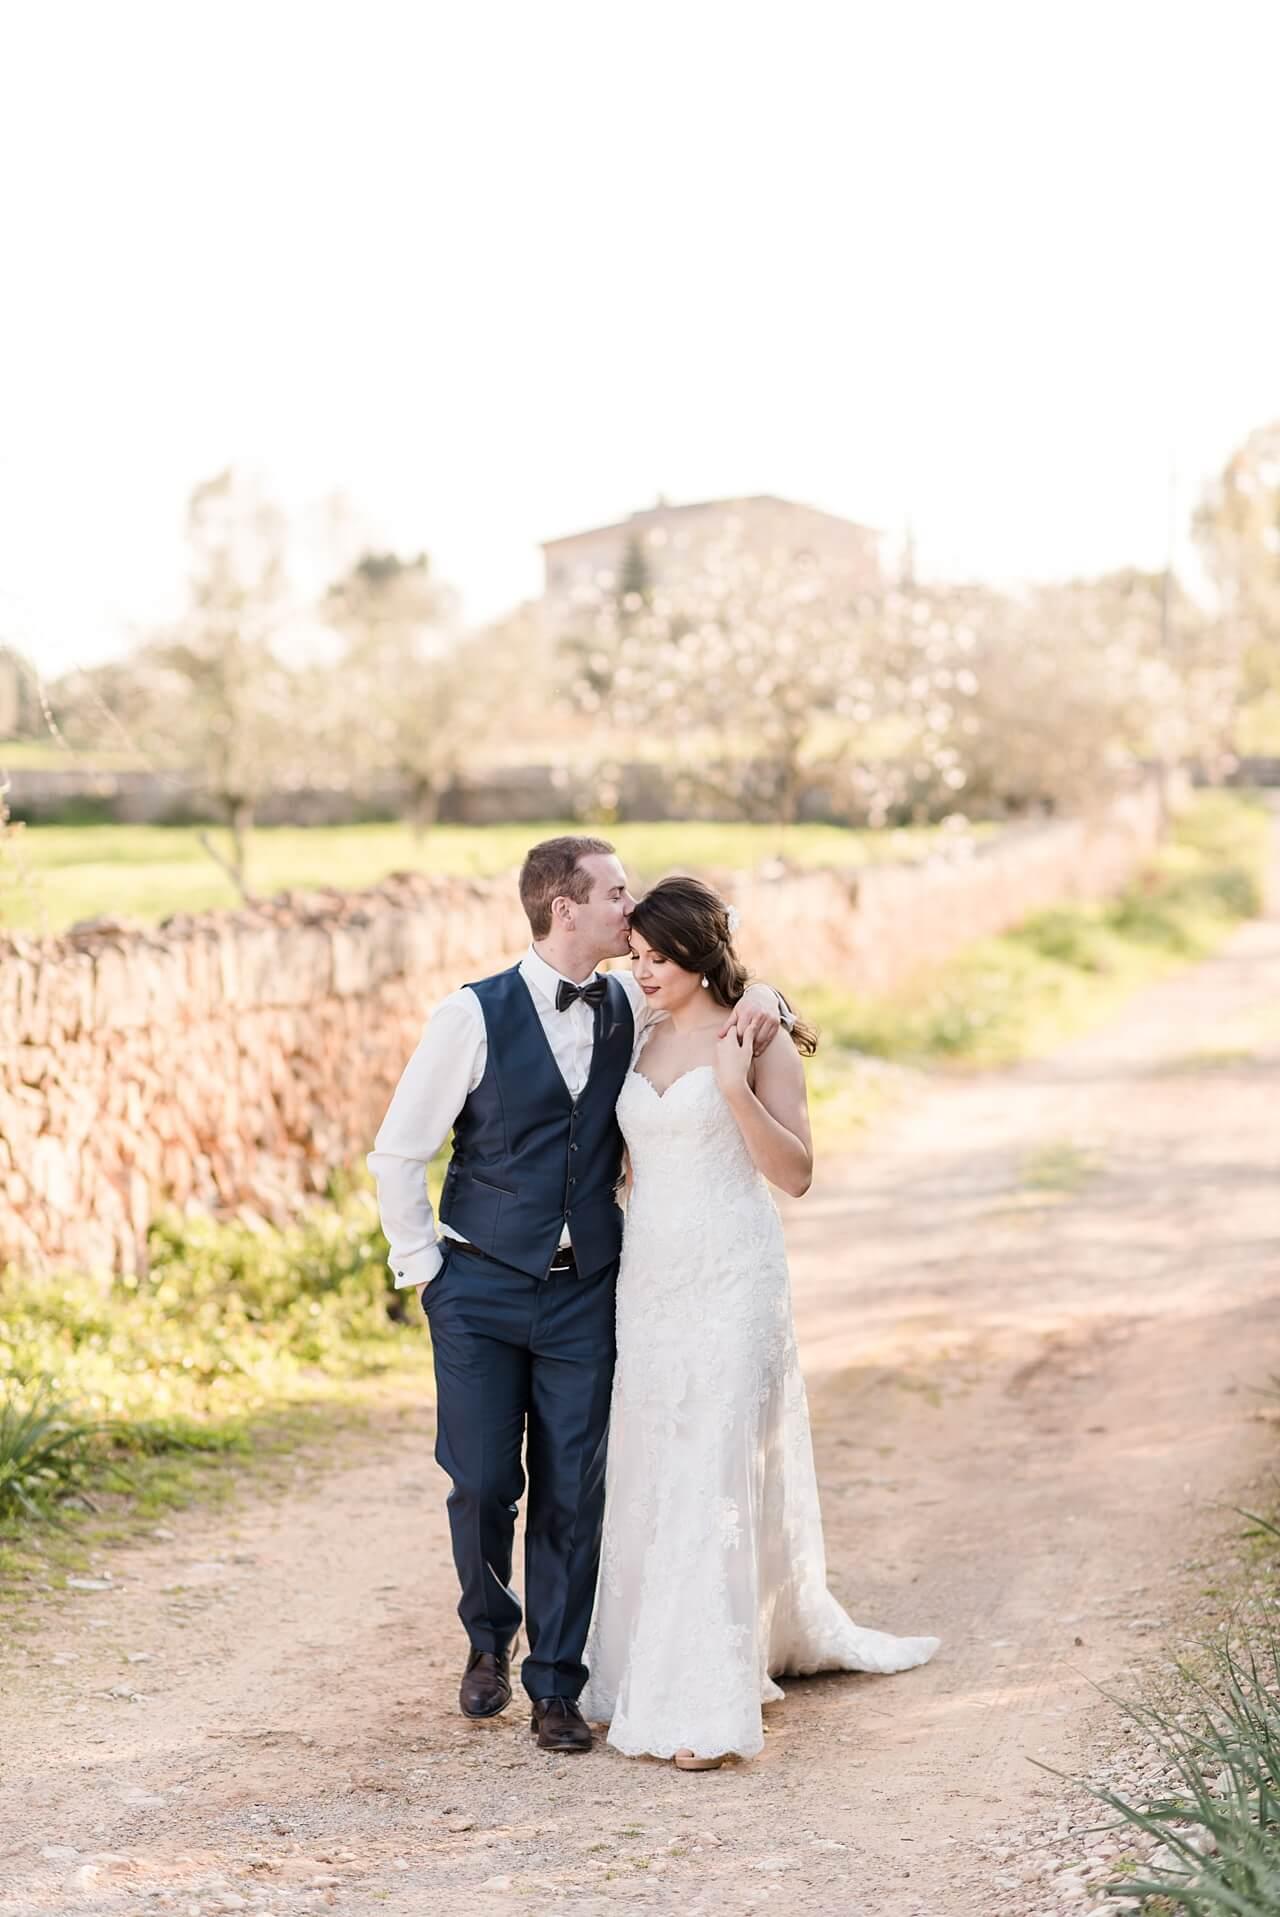 Rebecca Conte Fotografie: After Wedding Shoot Mallorca 45